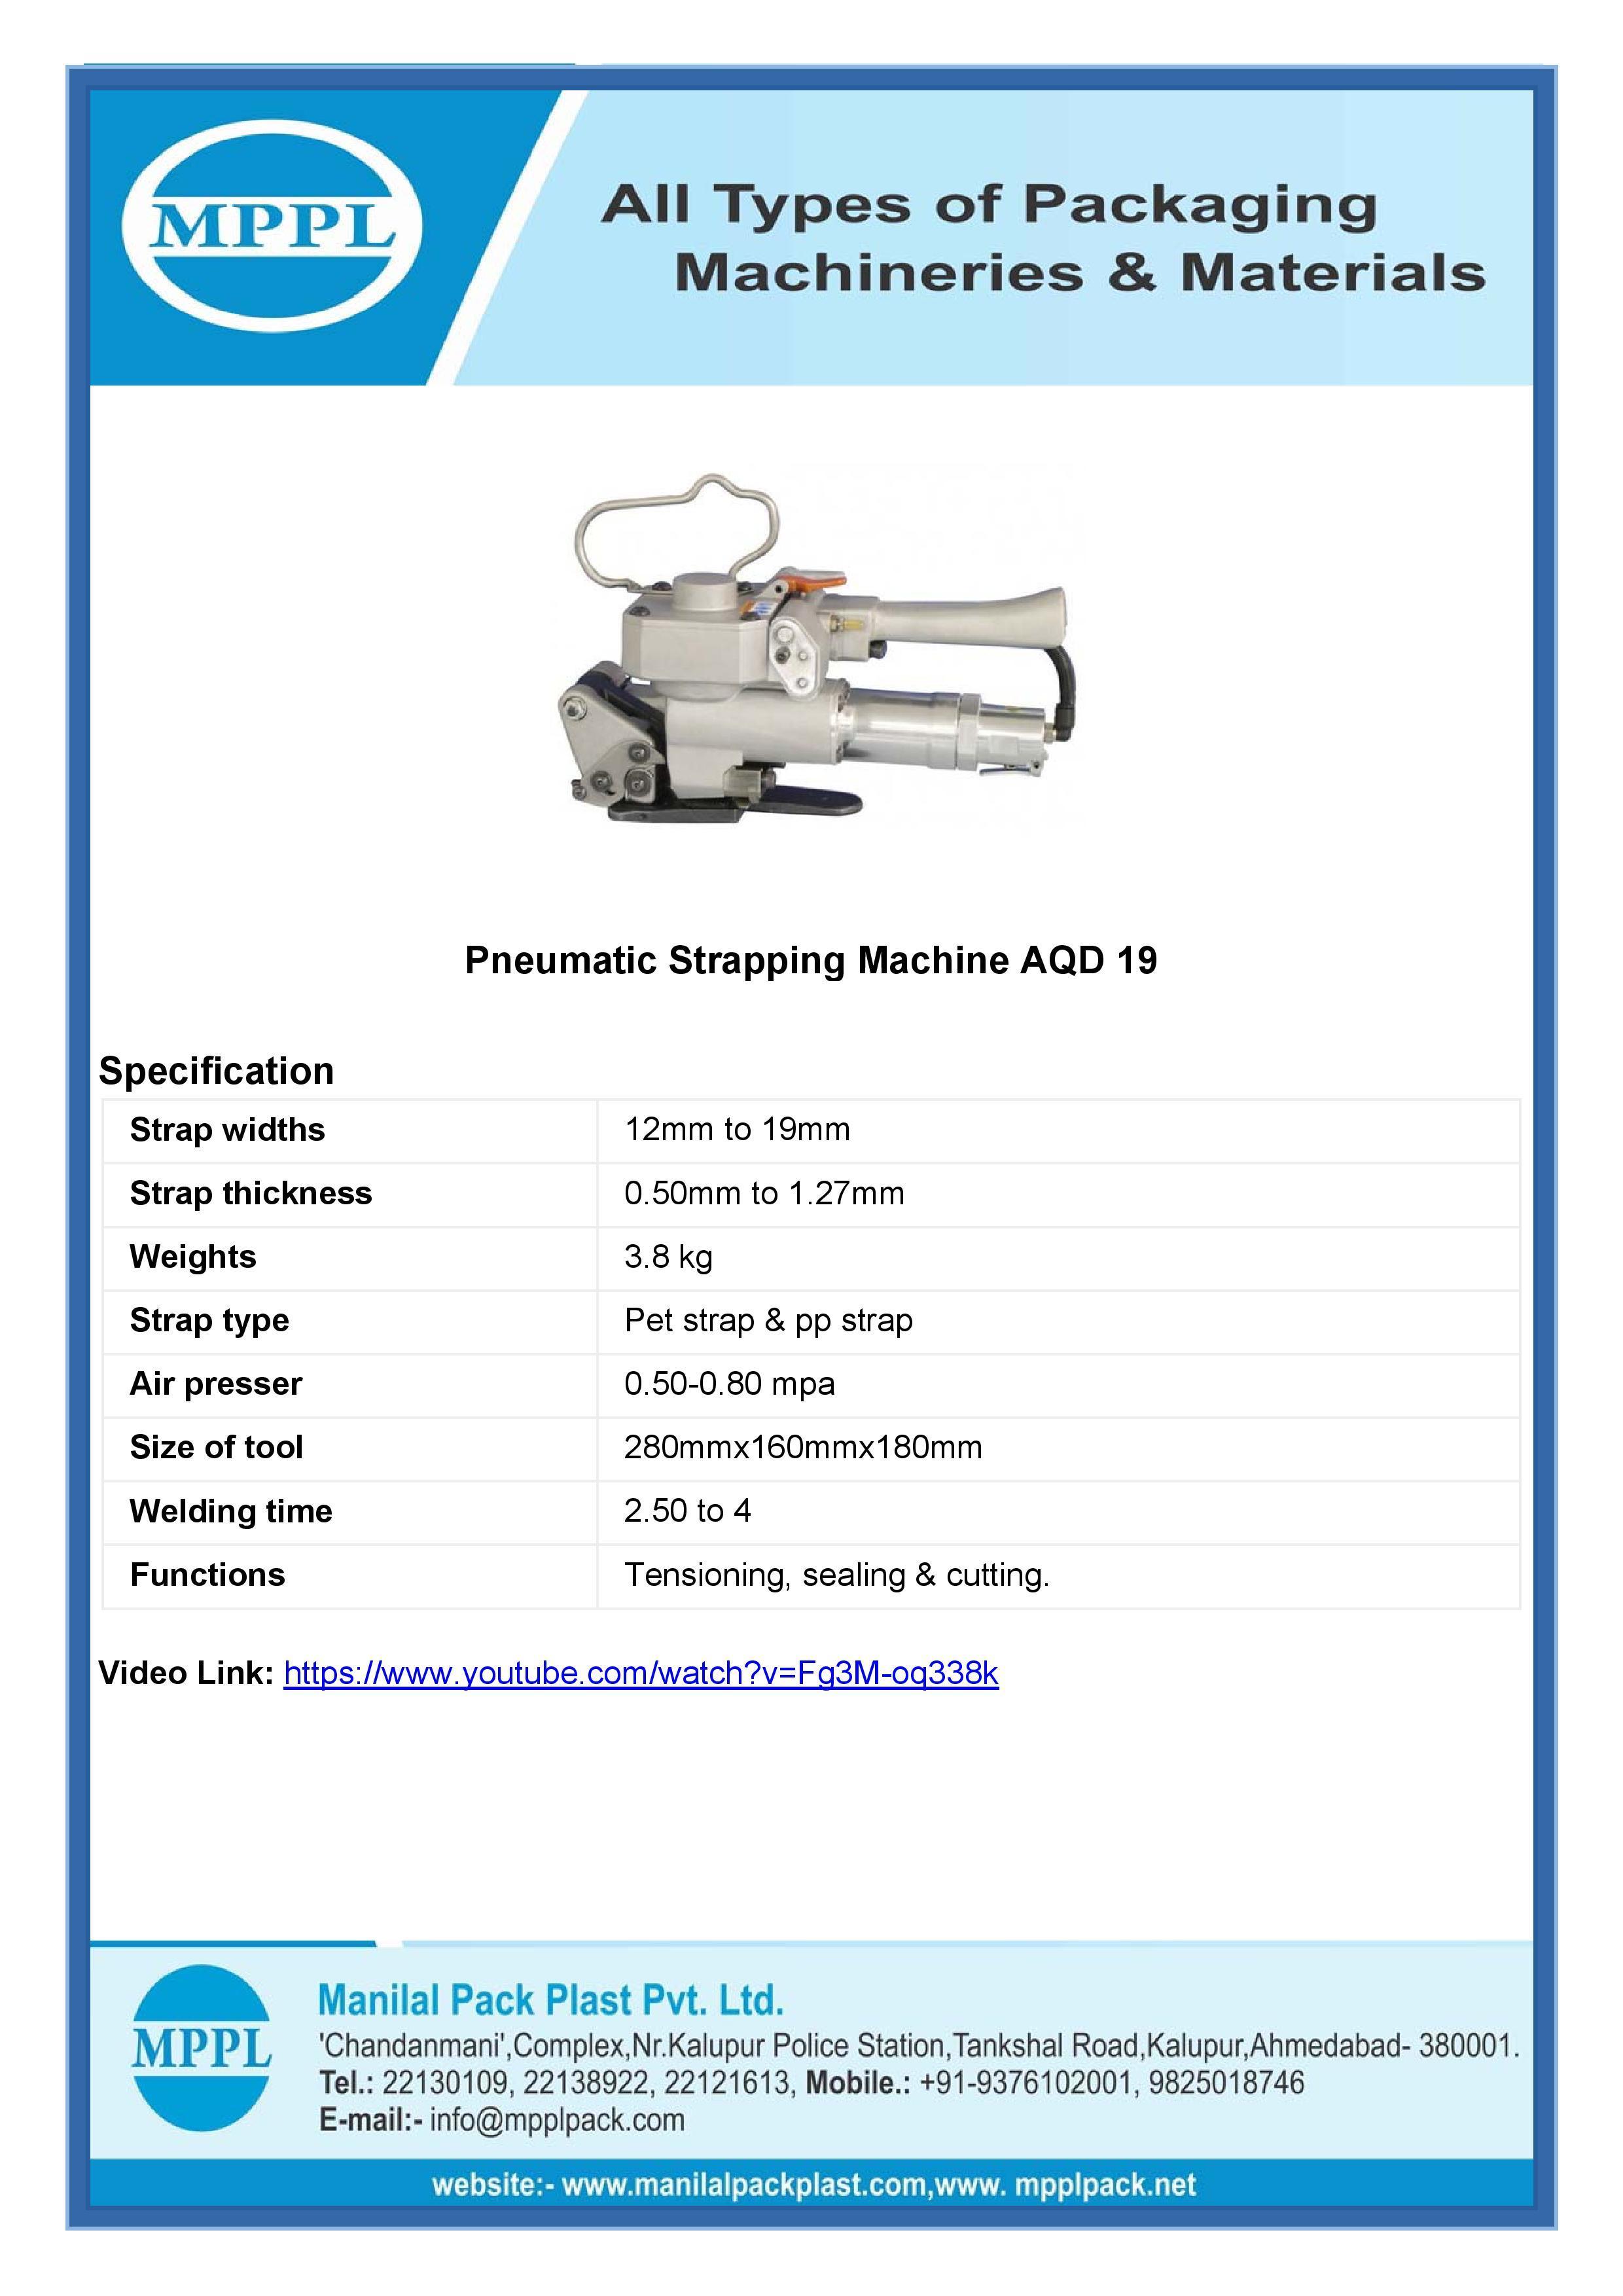 Pneumatic Strapping Machine Aqd 19